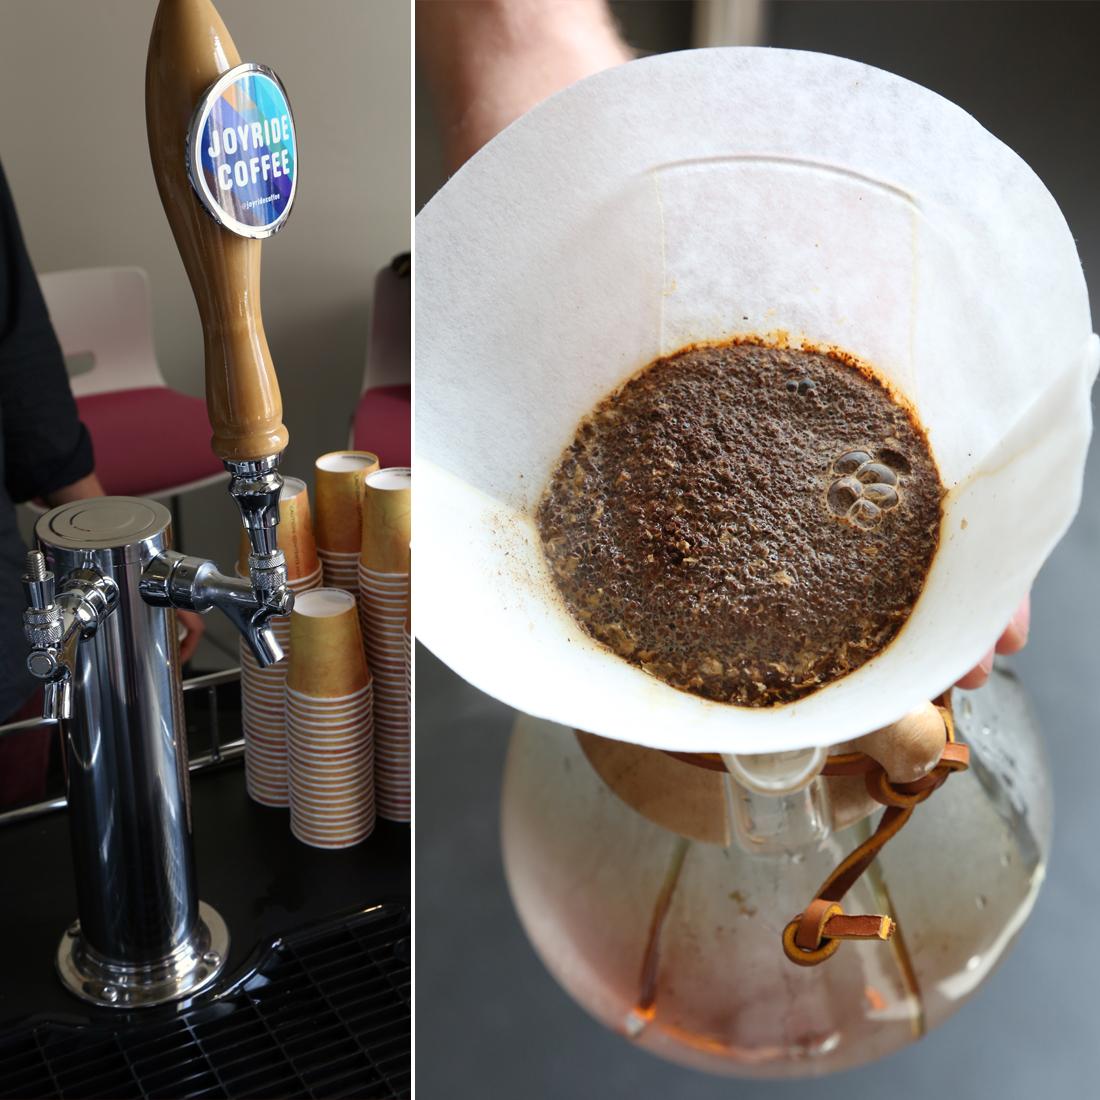 Joyride Coffee Distributors